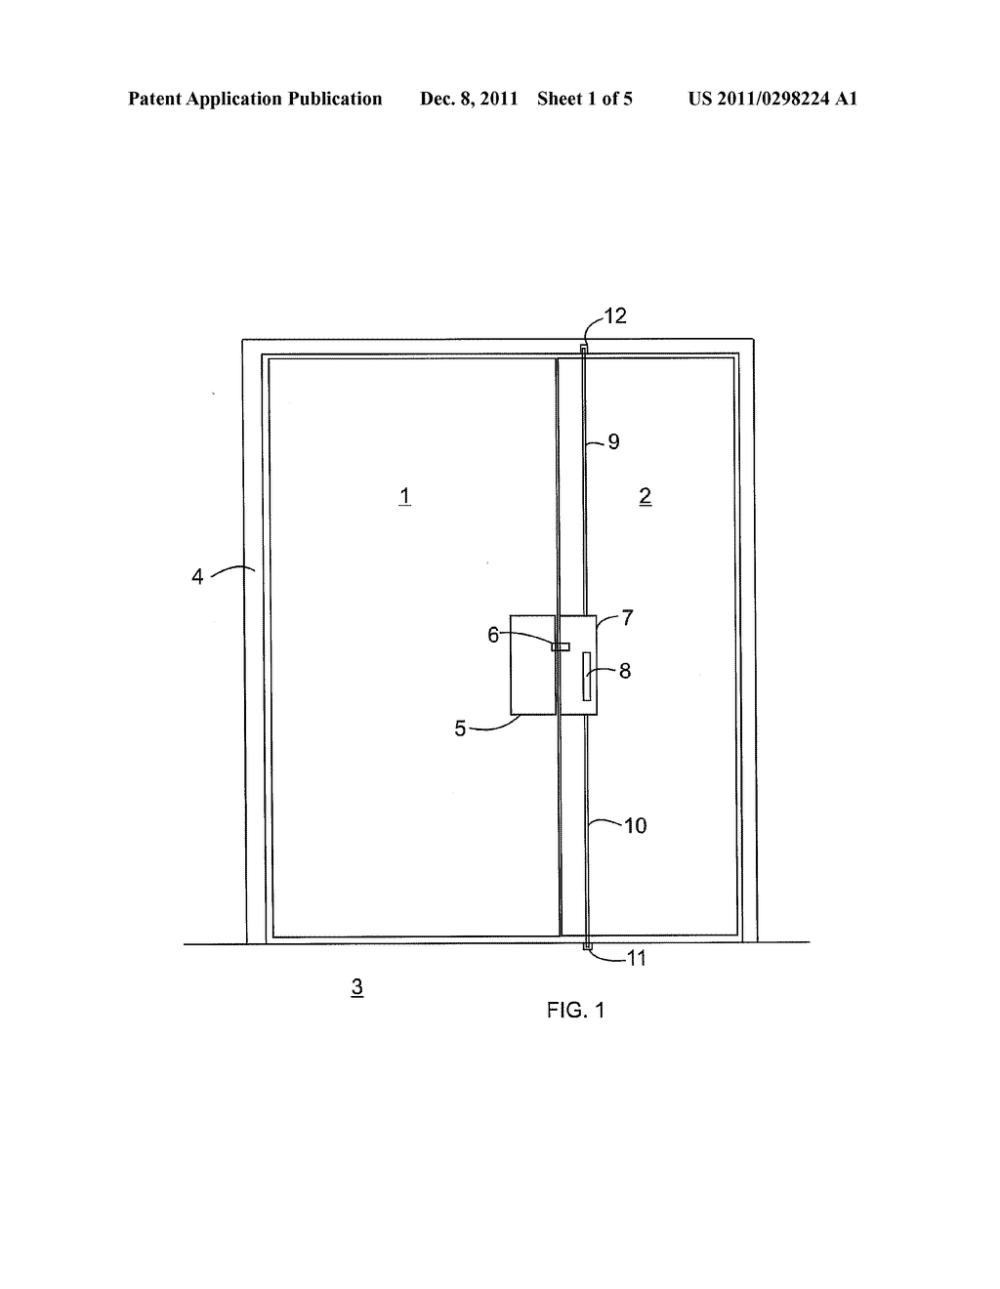 medium resolution of double door diagram wiring diagram for you double door refrigerator electrical diagram double door diagram source frost free refrigerator